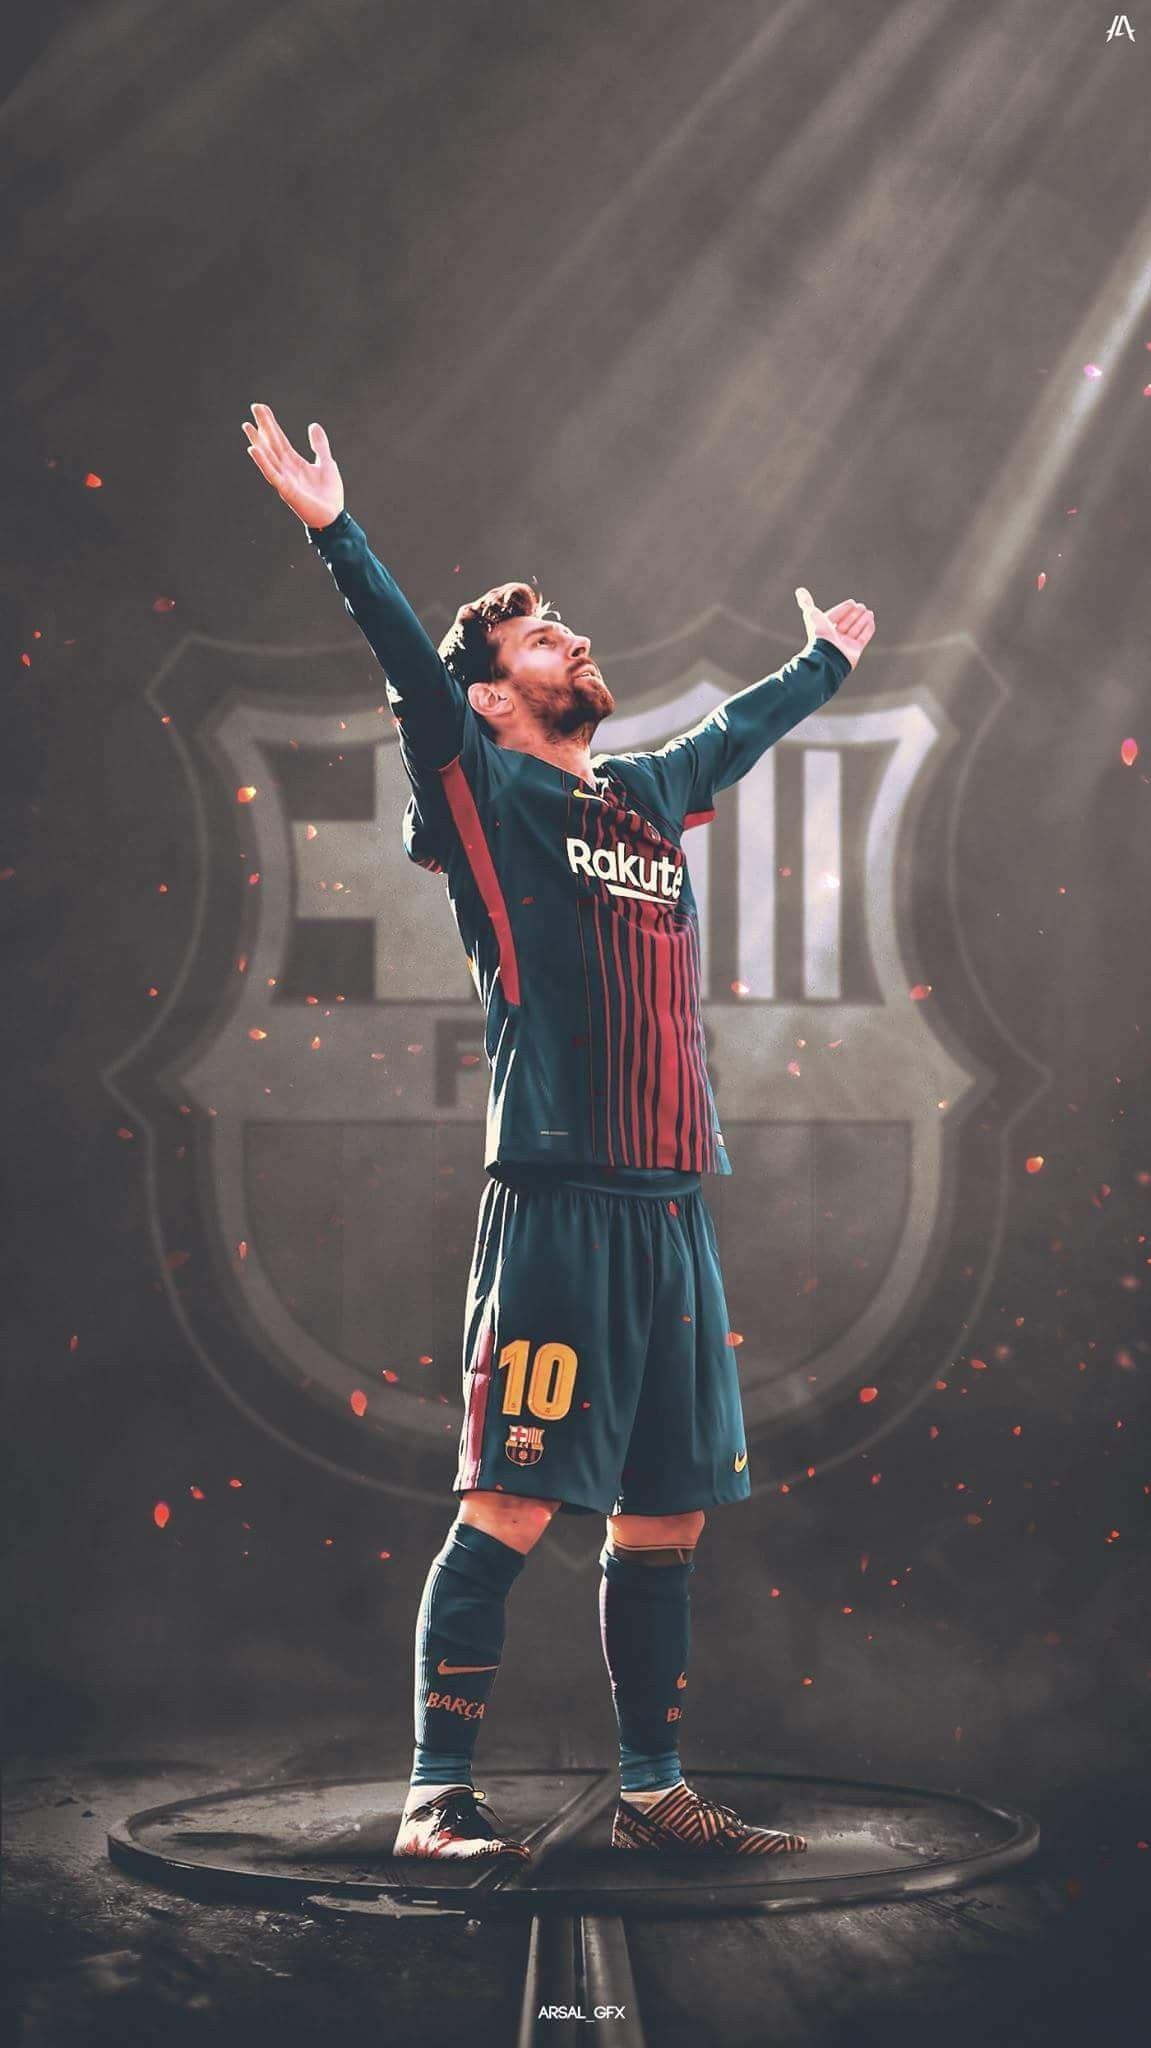 #Messi #GOAT #FCB #Barca | Lionel messi wallpapers, Messi vs ronaldo, Messi, ronaldo